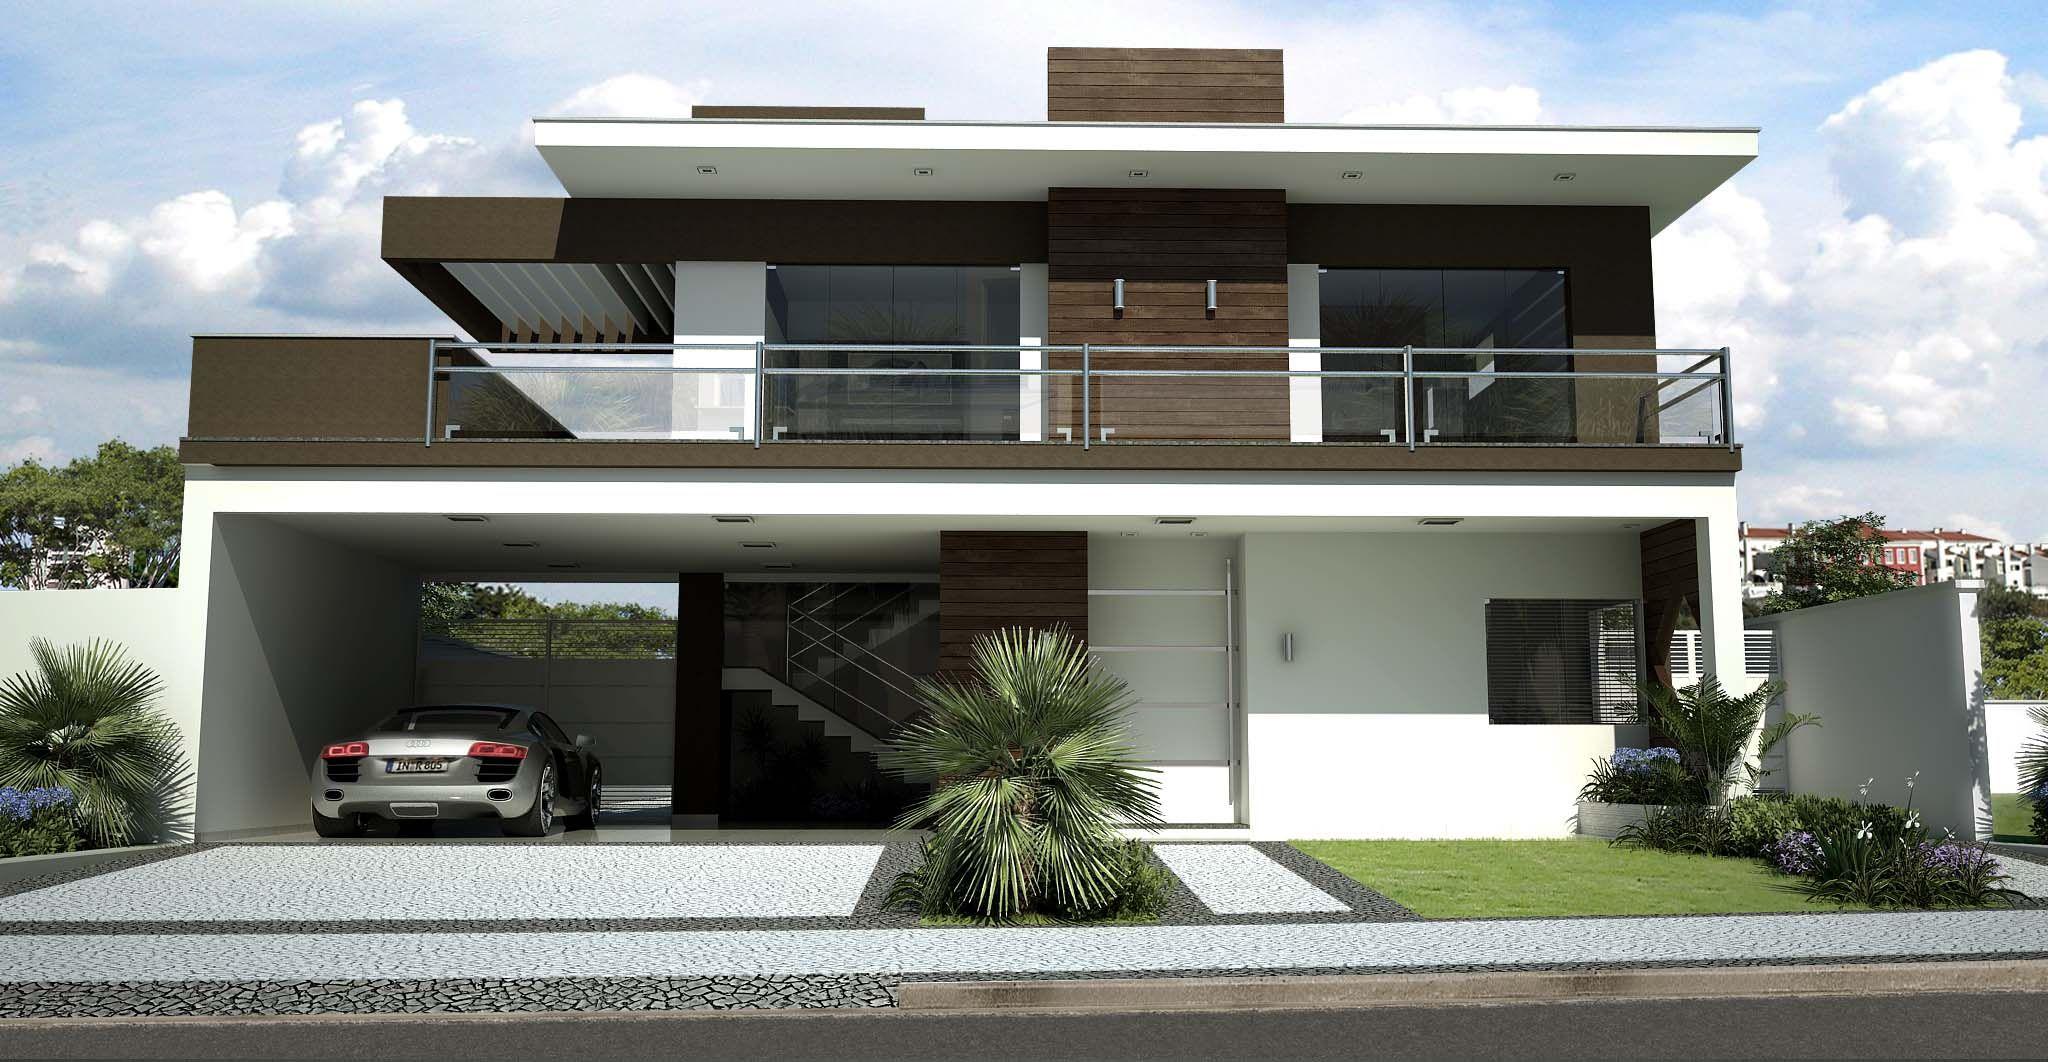 Casa fachada pesquisa google arquitetura pinterest for Casas modernas fachadas bonitas